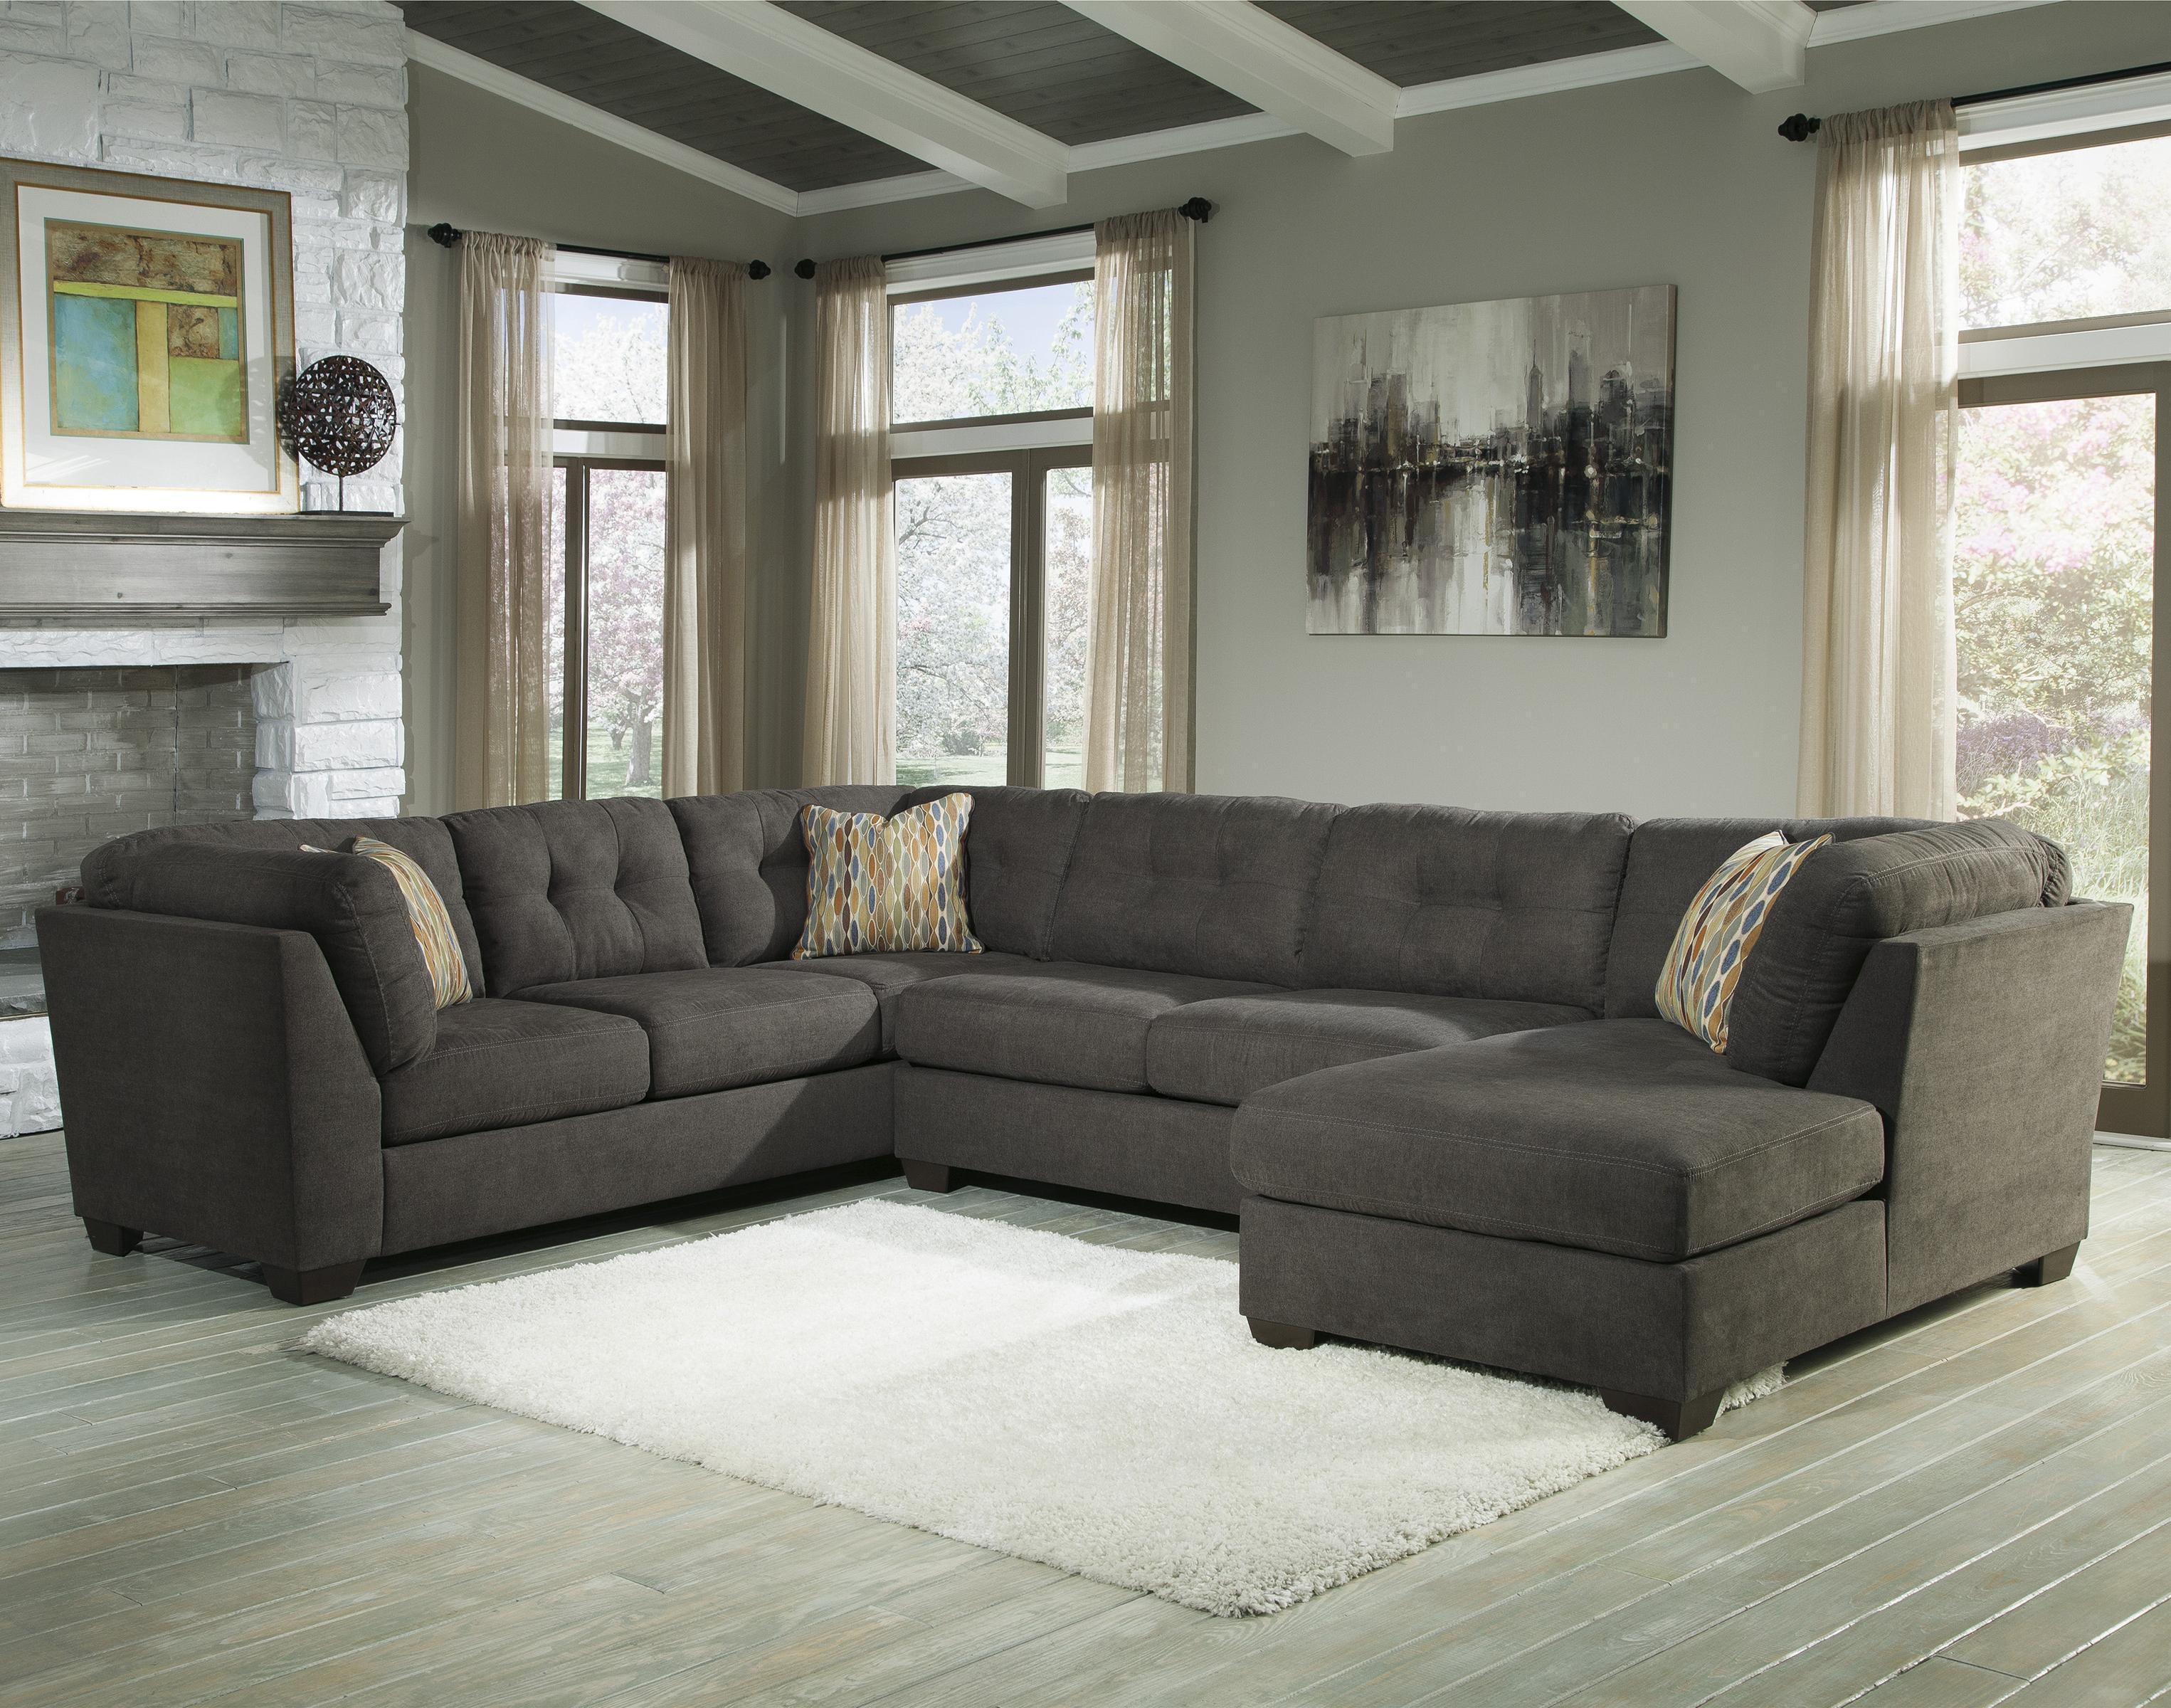 Modular Sectional Sofa Curved Modular Sectional Sofa With End